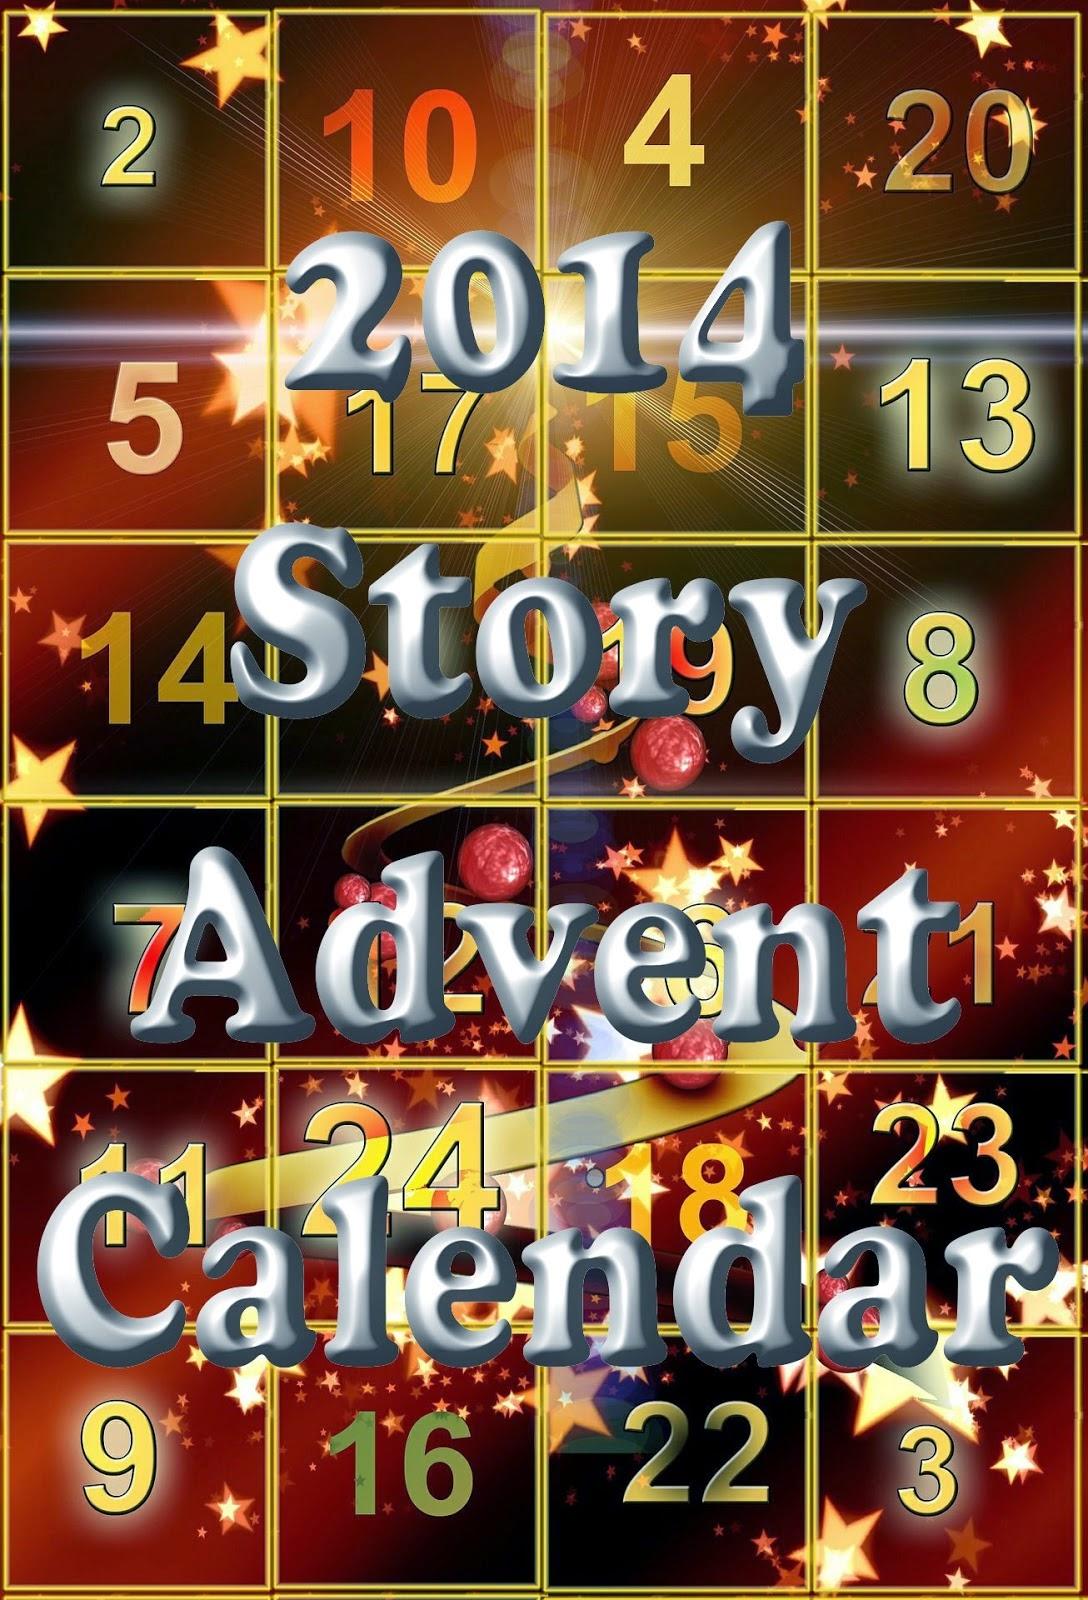 http://chapterbookchallenge.blogspot.nl/2014/11/story-advent-calendar-blog-hop.html?spref=fb